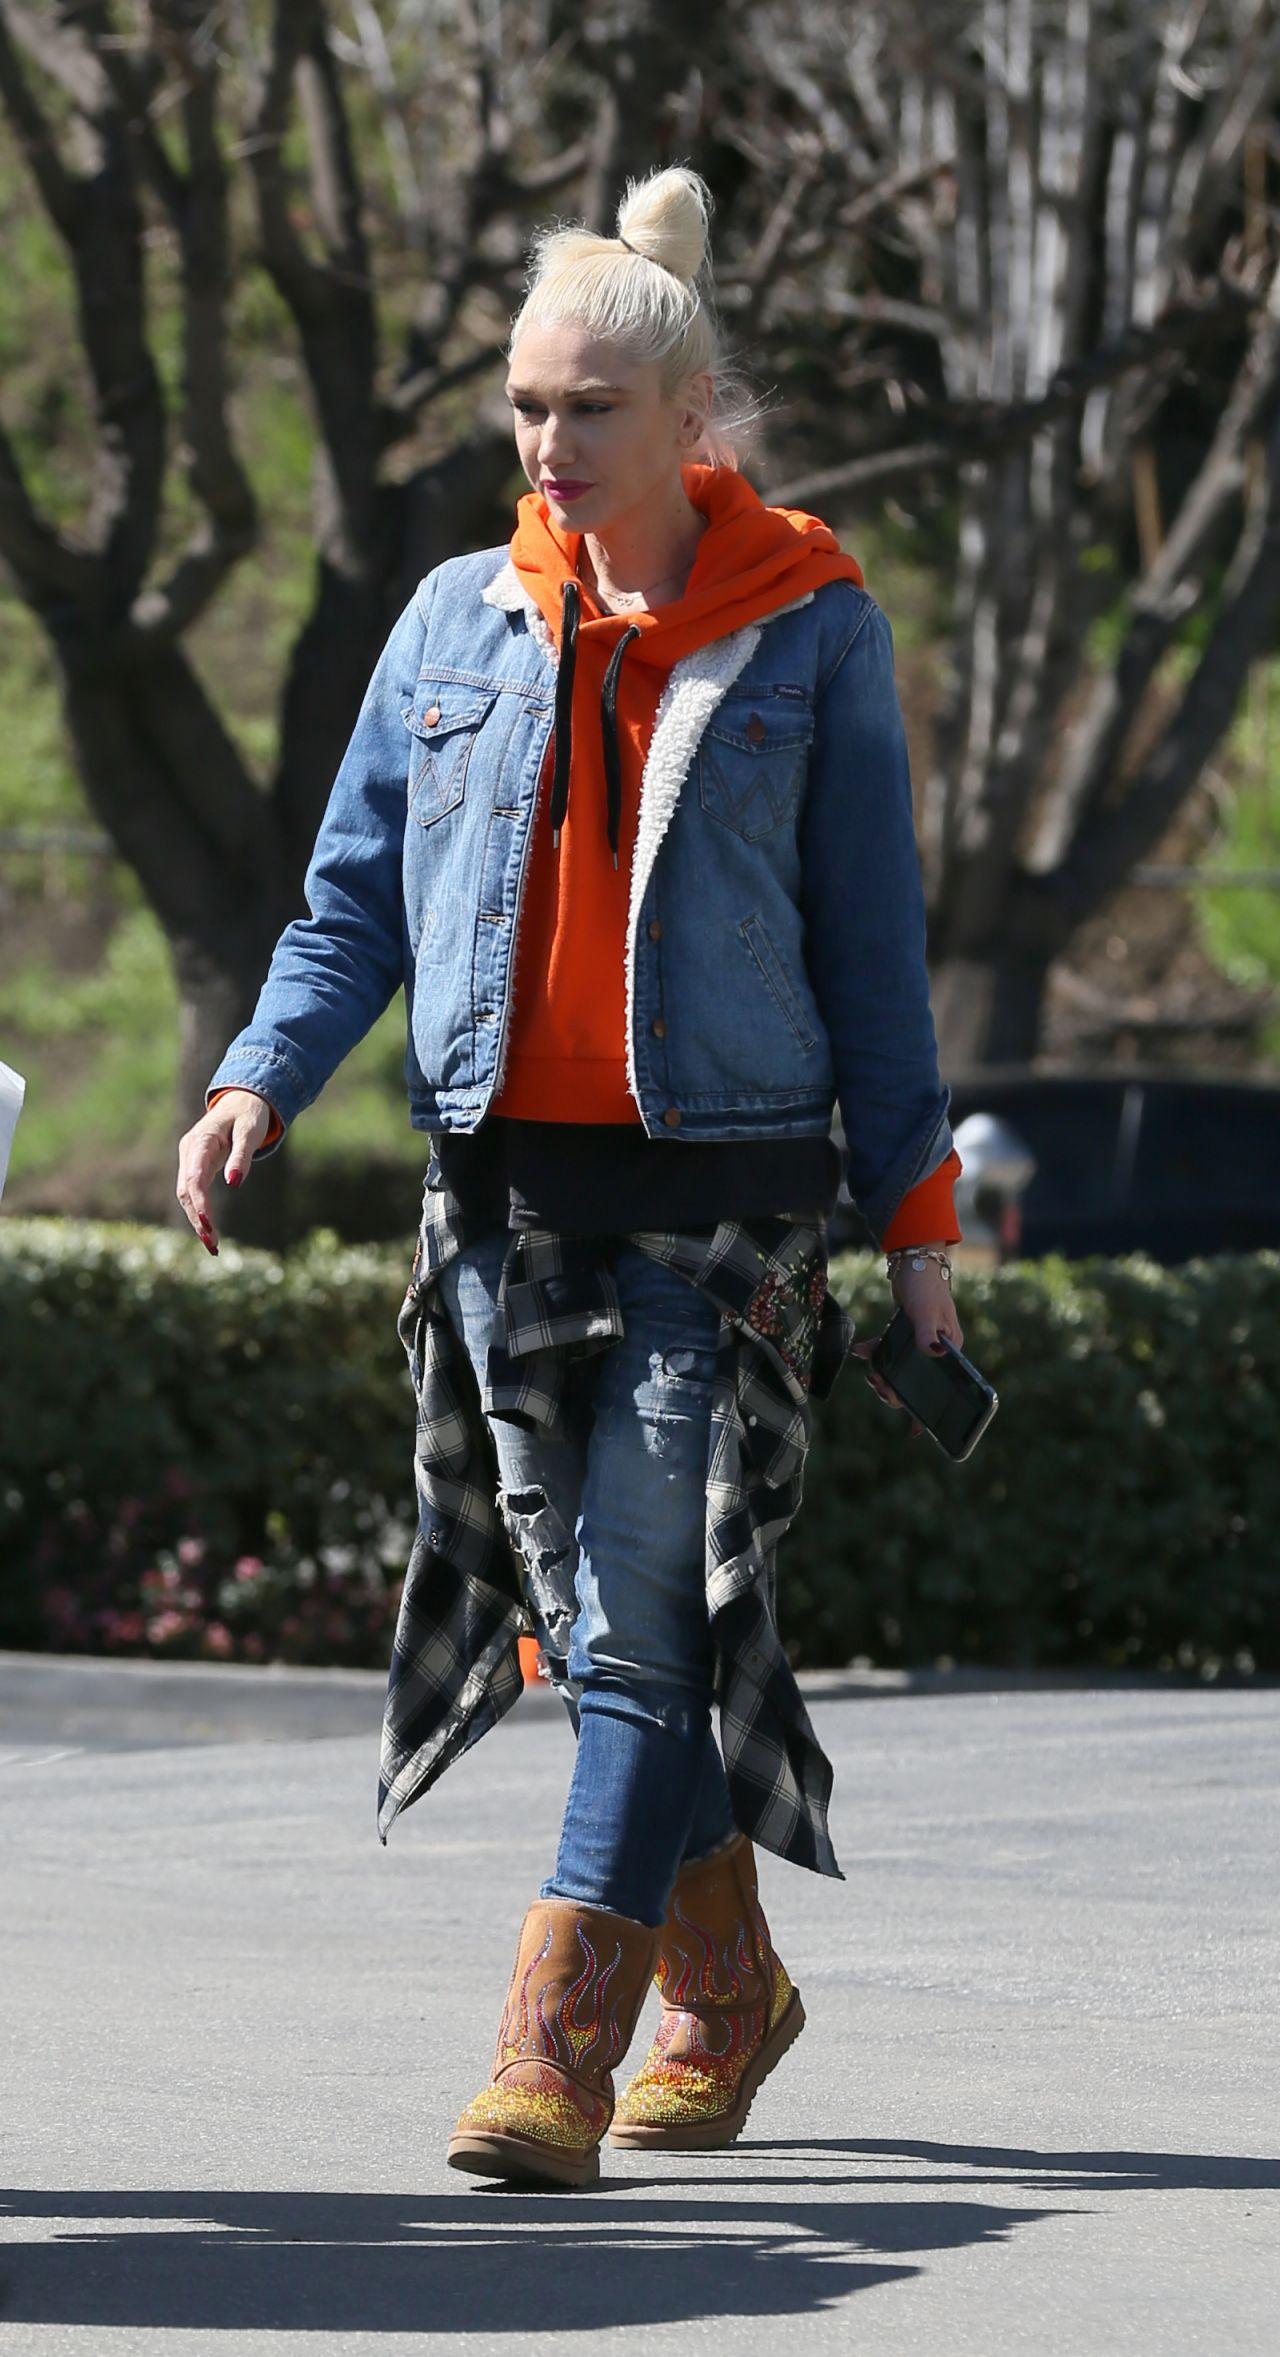 Gwen Stefani Urban Street Style Los Angeles 03 15 2018